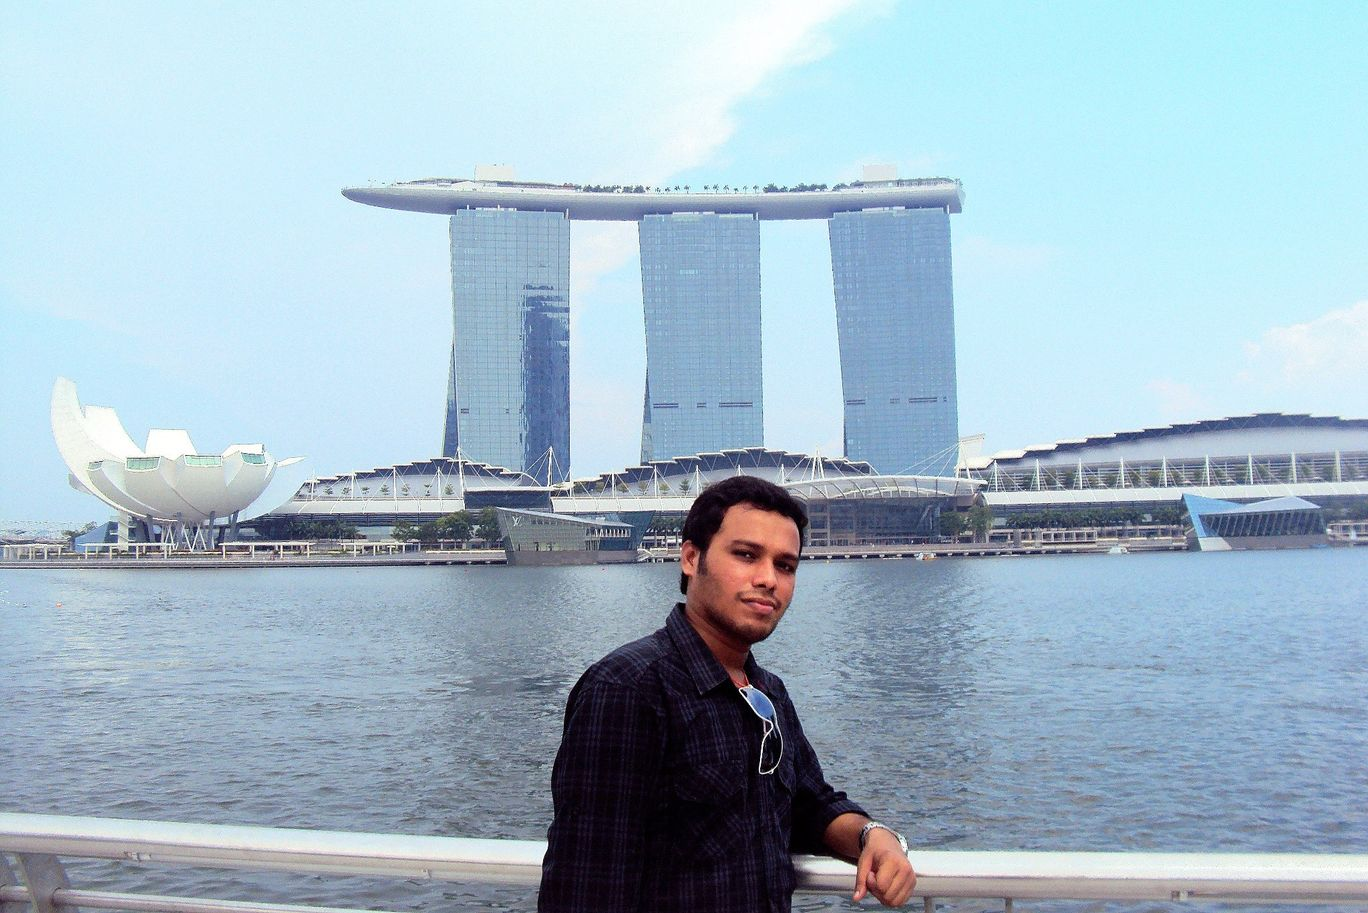 Photo of Singapore By Rahul Agarwal